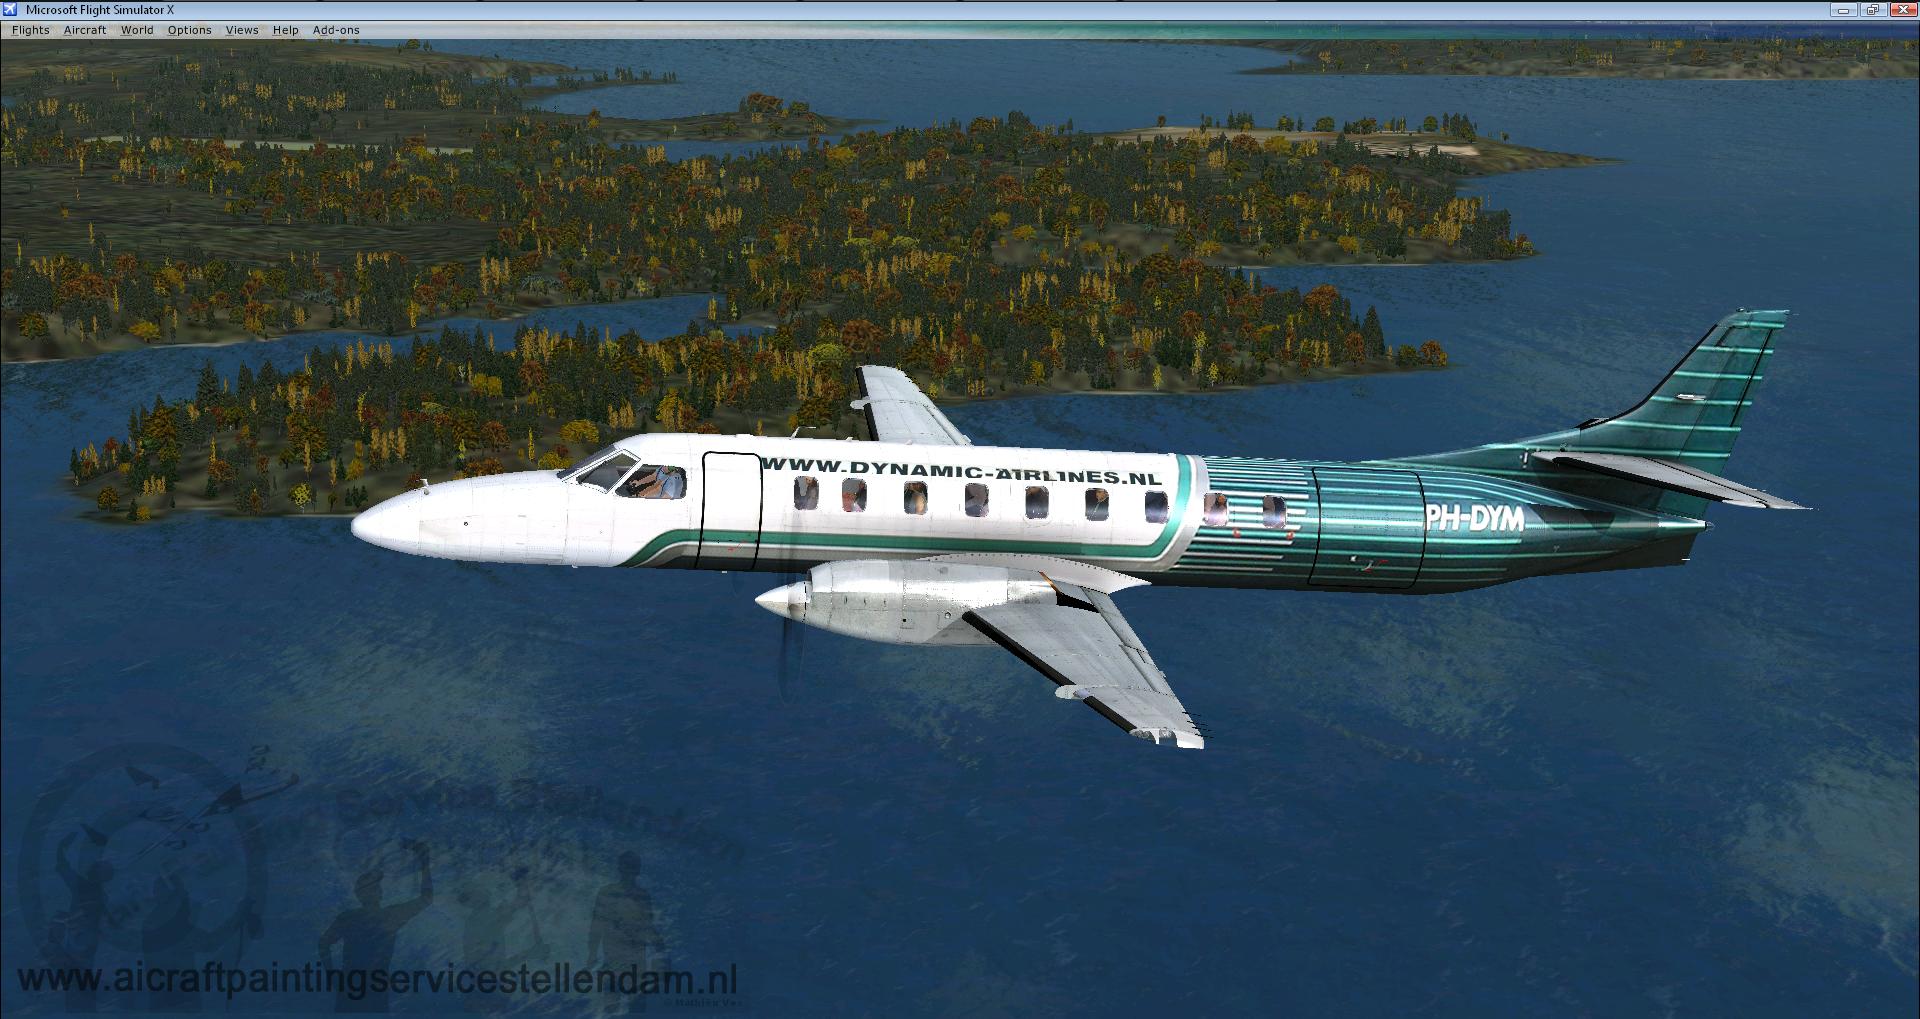 RAMBAZ_MetroIII_DynamicAirlines_PH-DYM